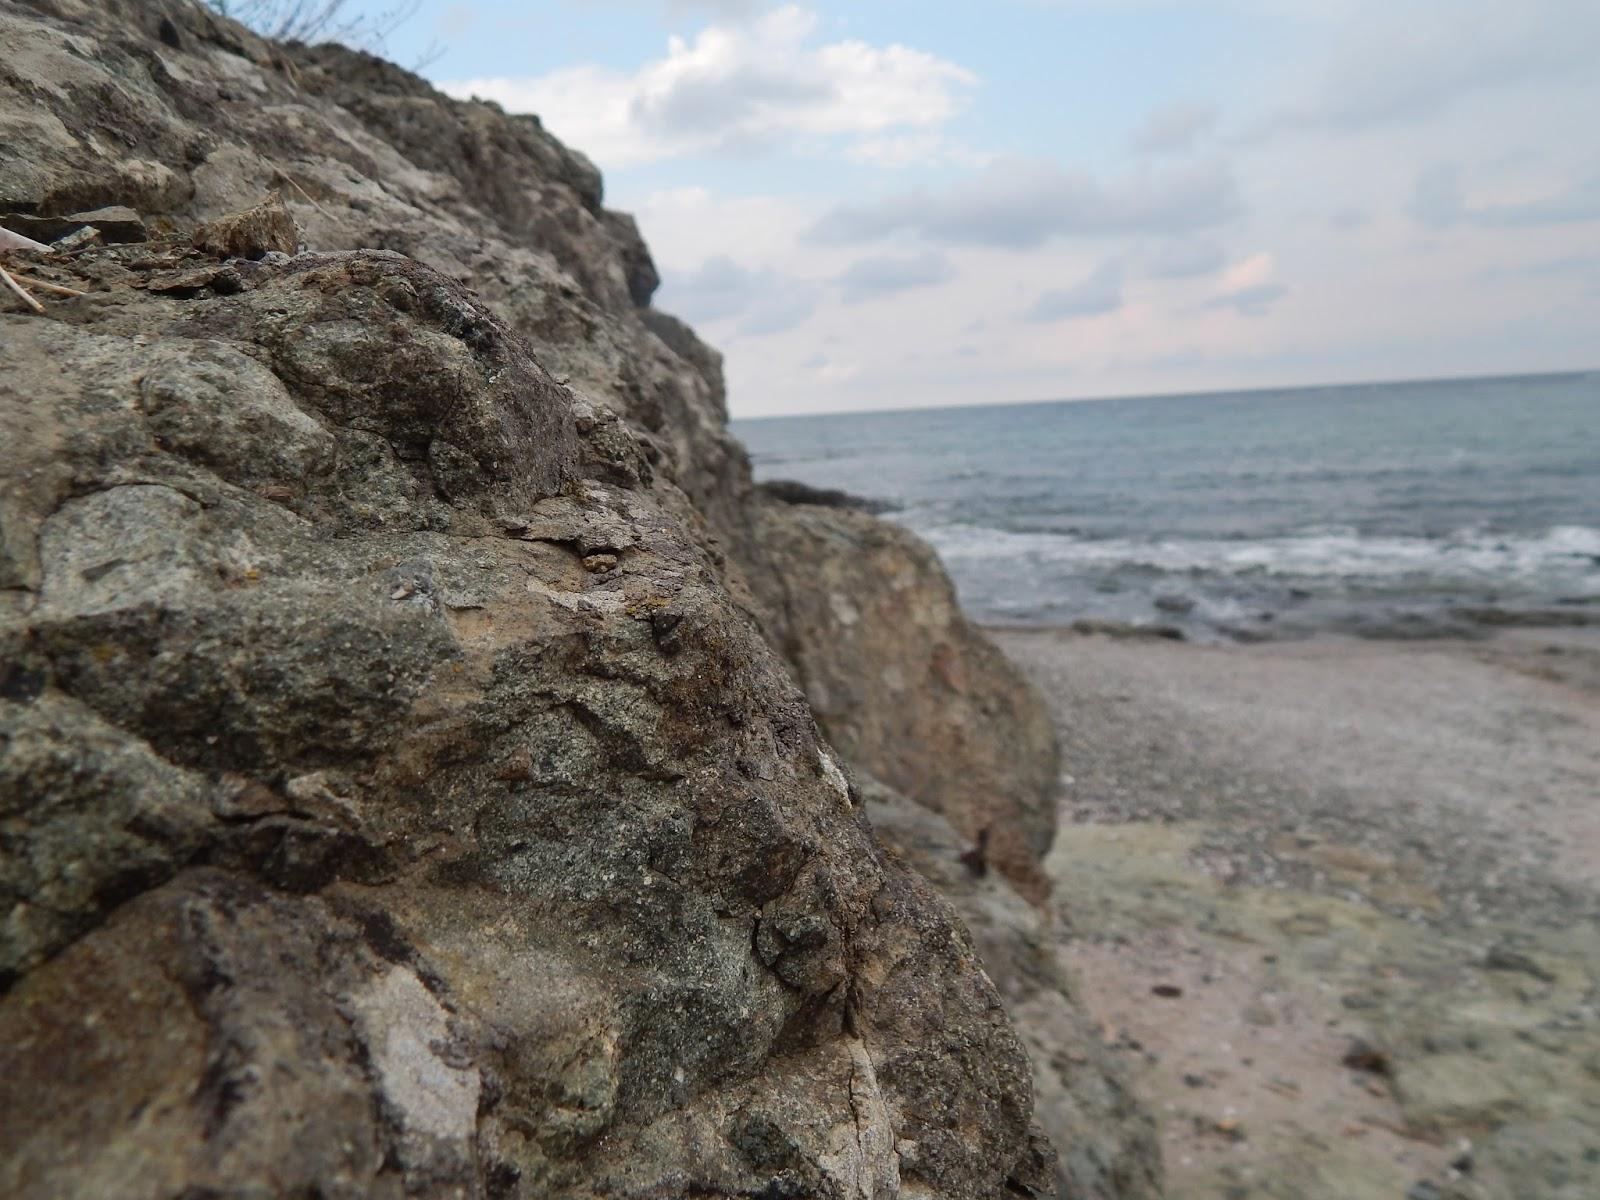 pláž v Tsarevu v Bulharsku